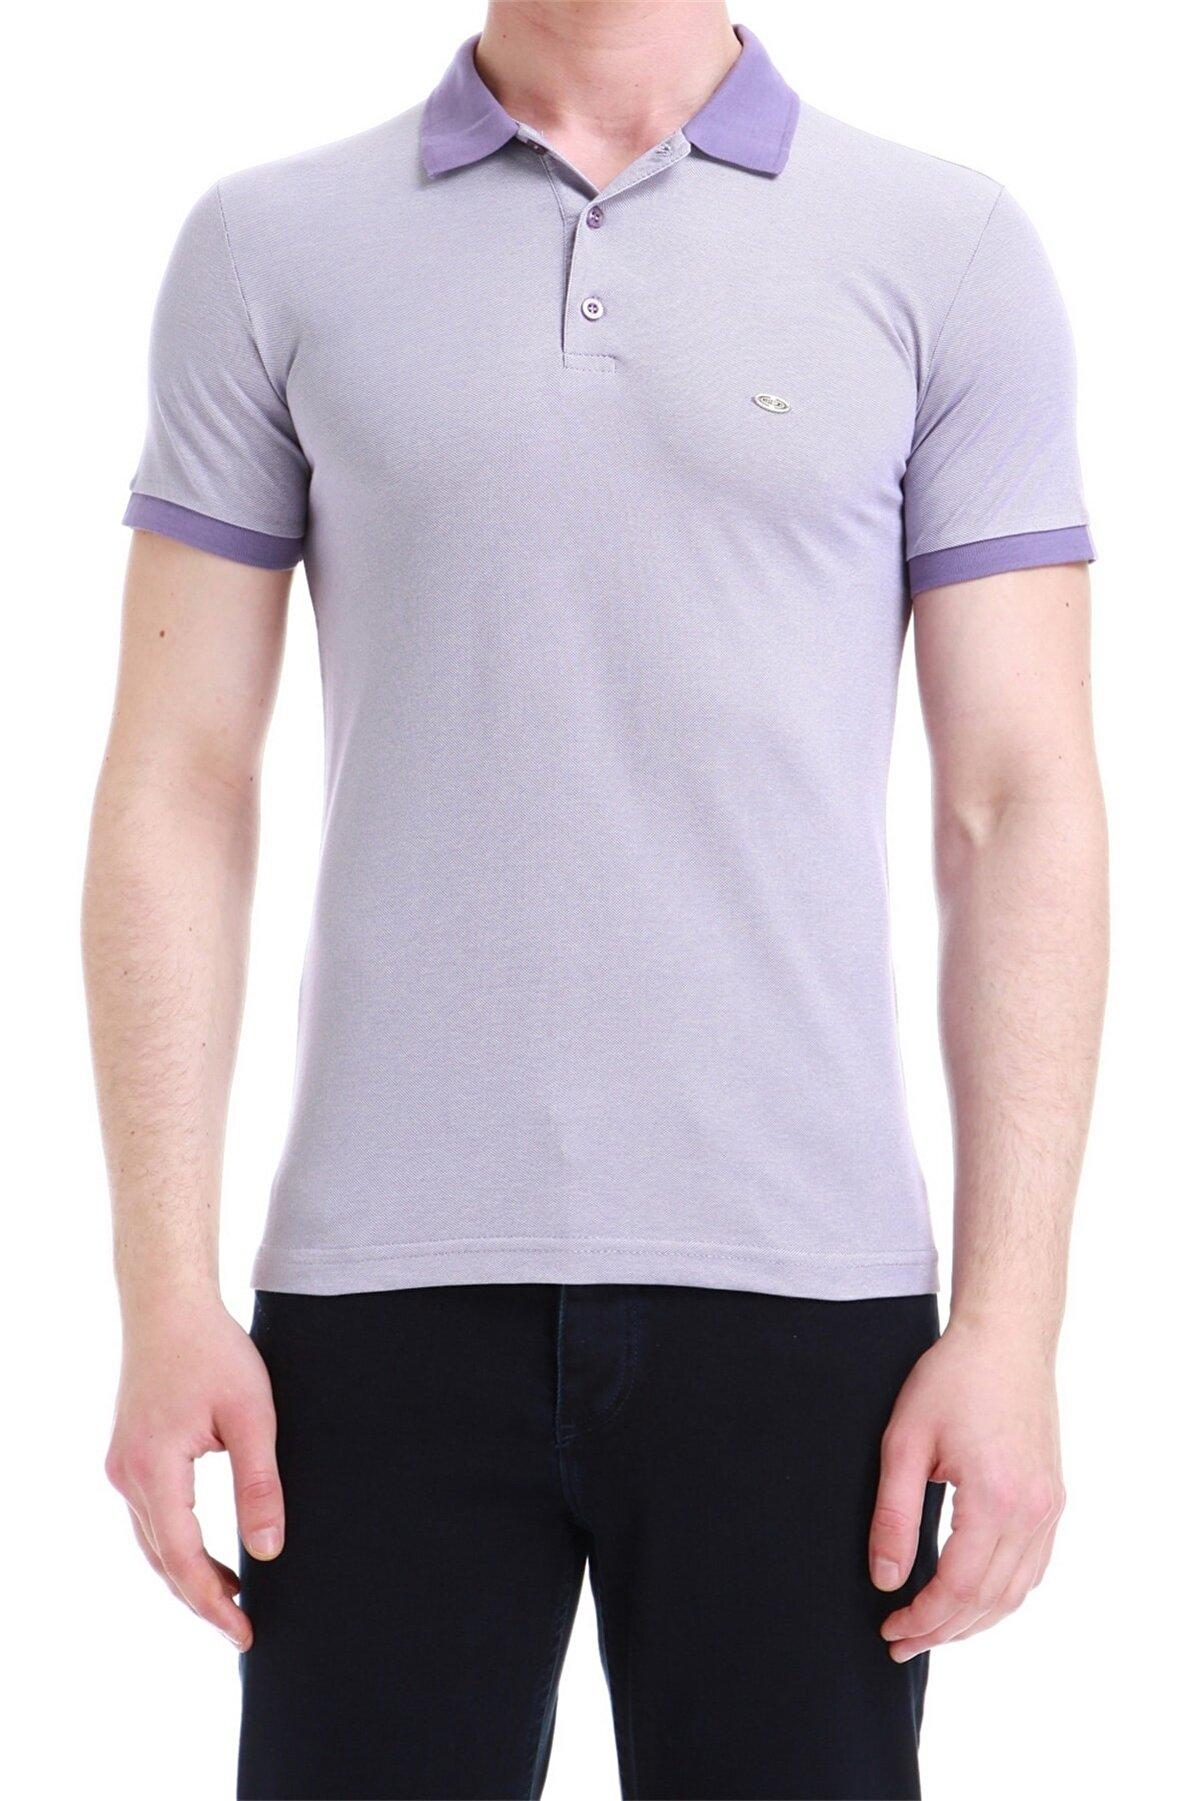 Efor Ts 728 Slim Fit Mor Spor T-shirt